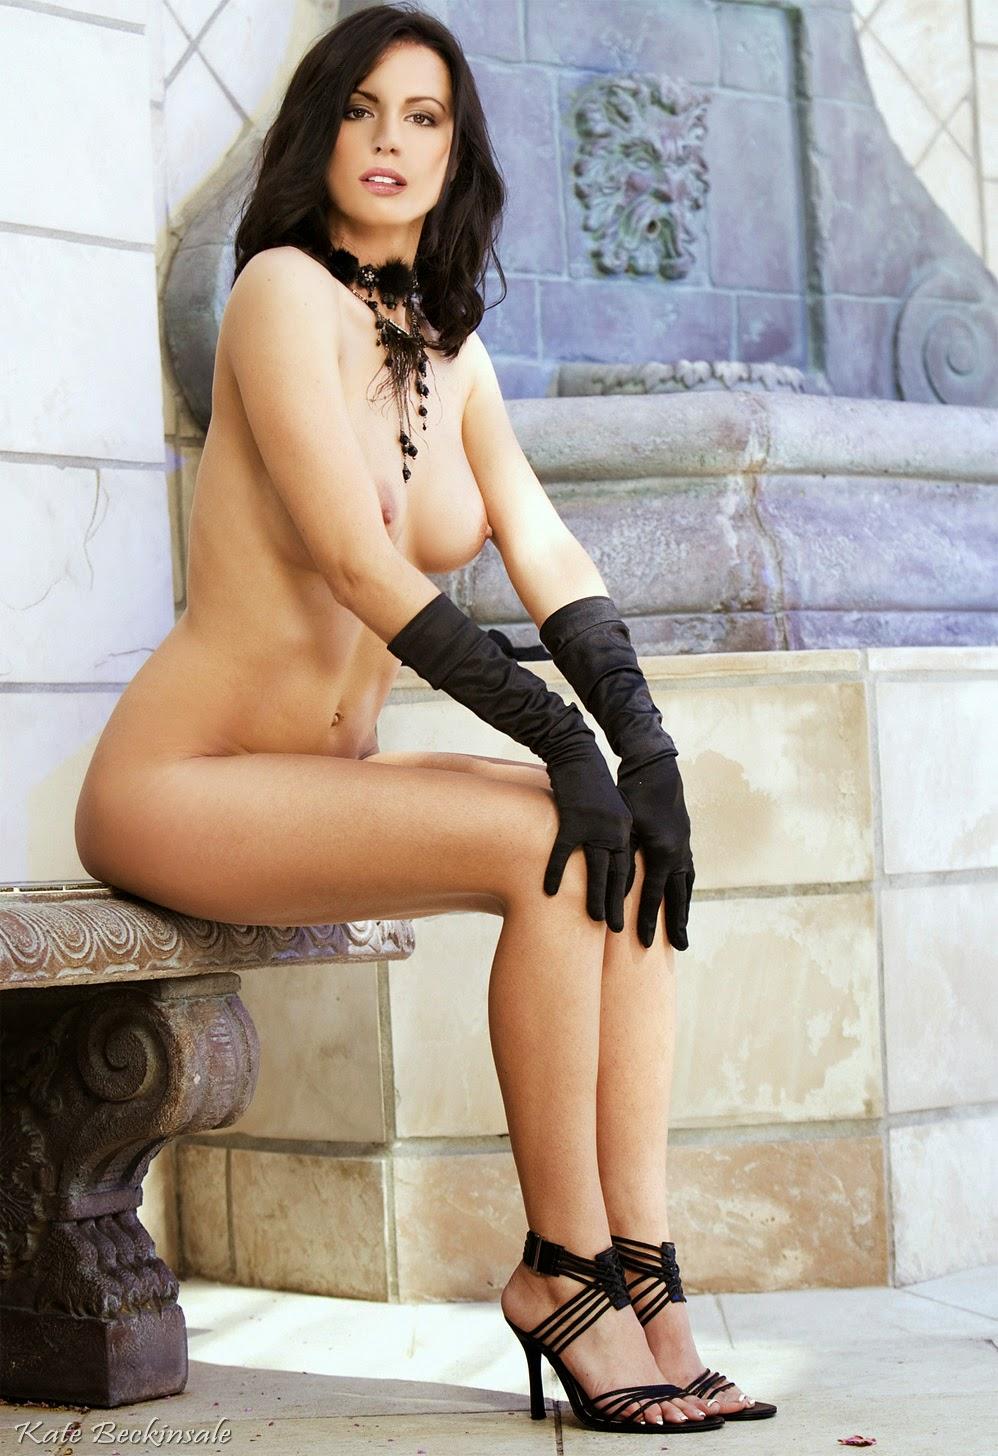 Pics Of Kate Beckinsale Naked 73